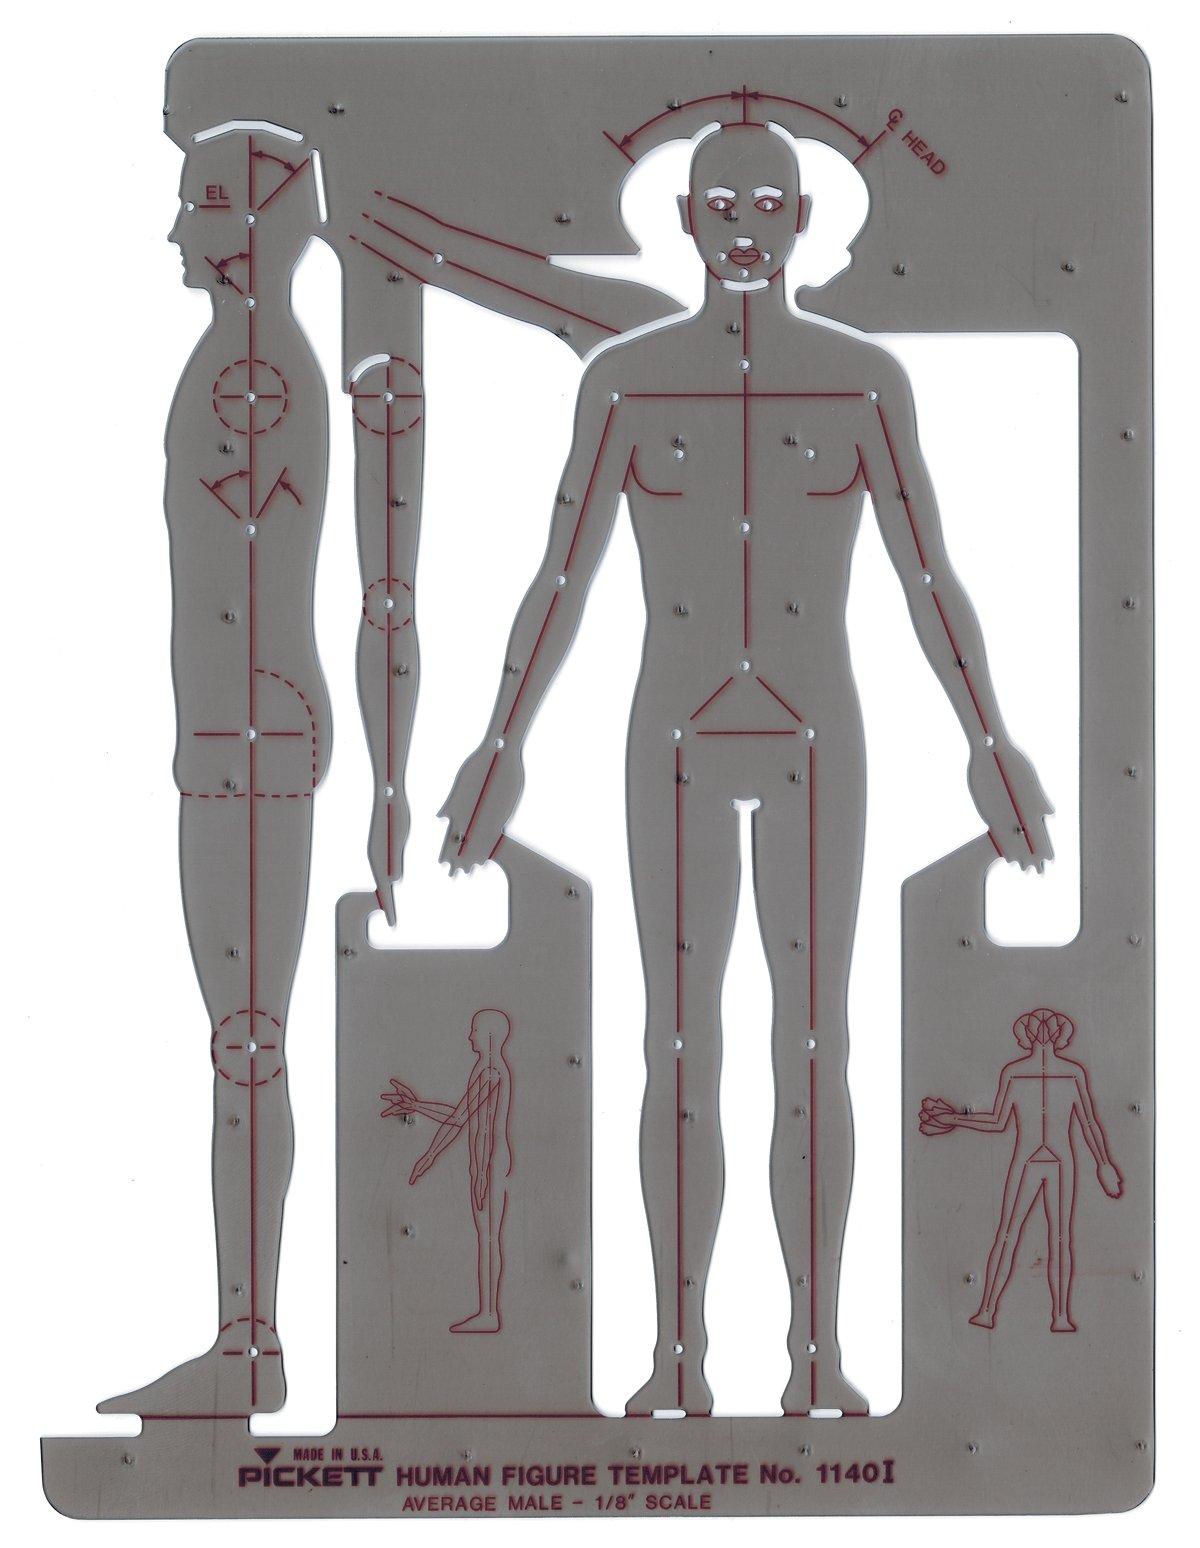 Pickett Male Human Figure Template (1140I)